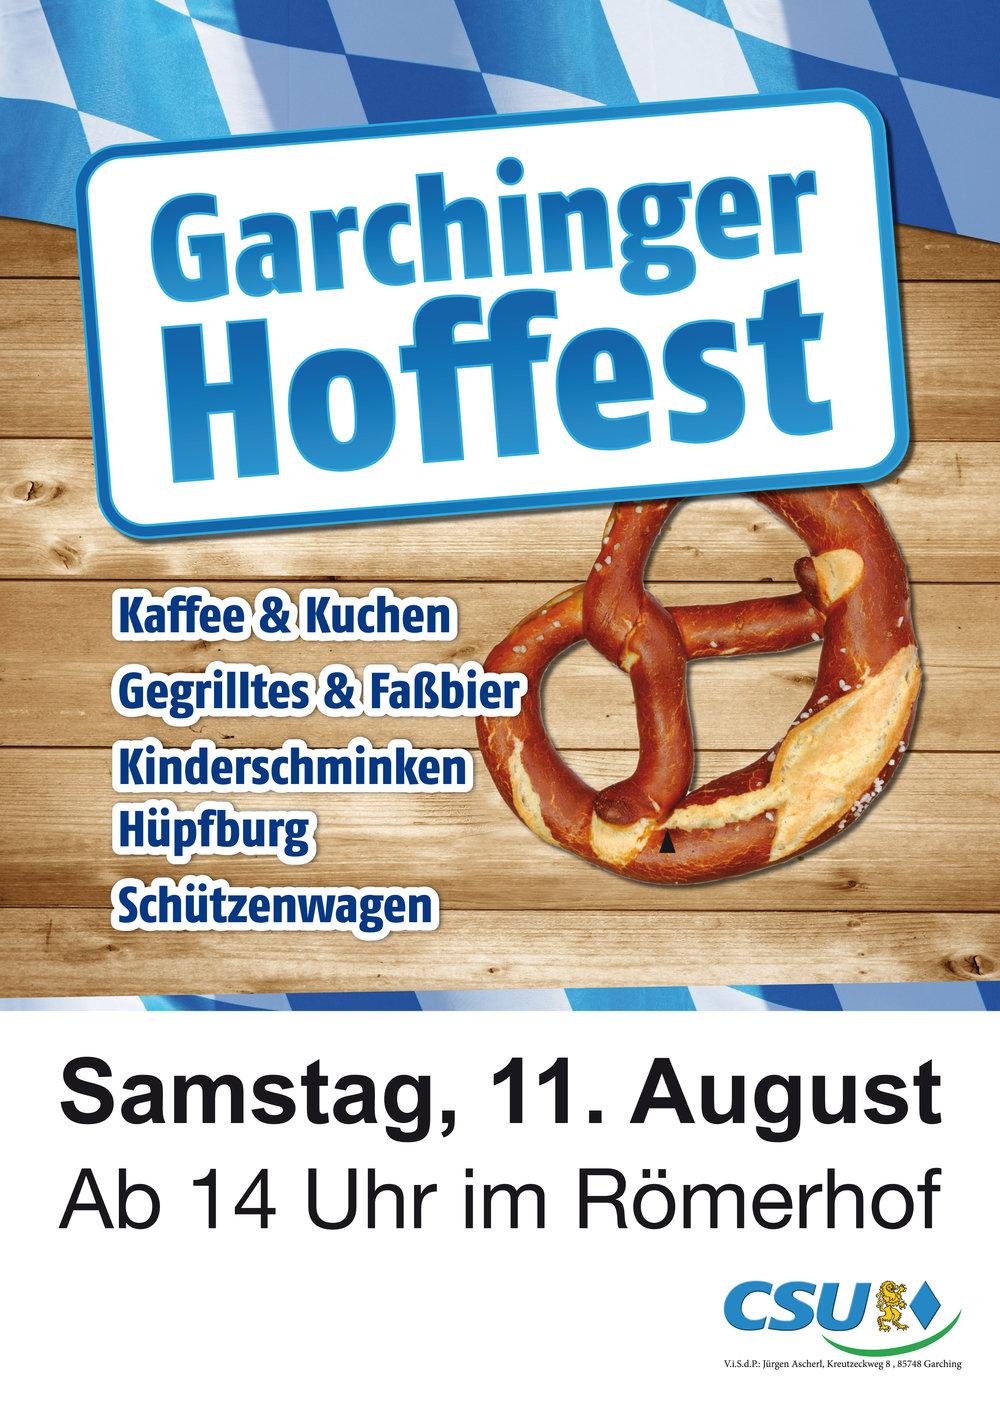 web_hoffest2016_Facebook.jpg